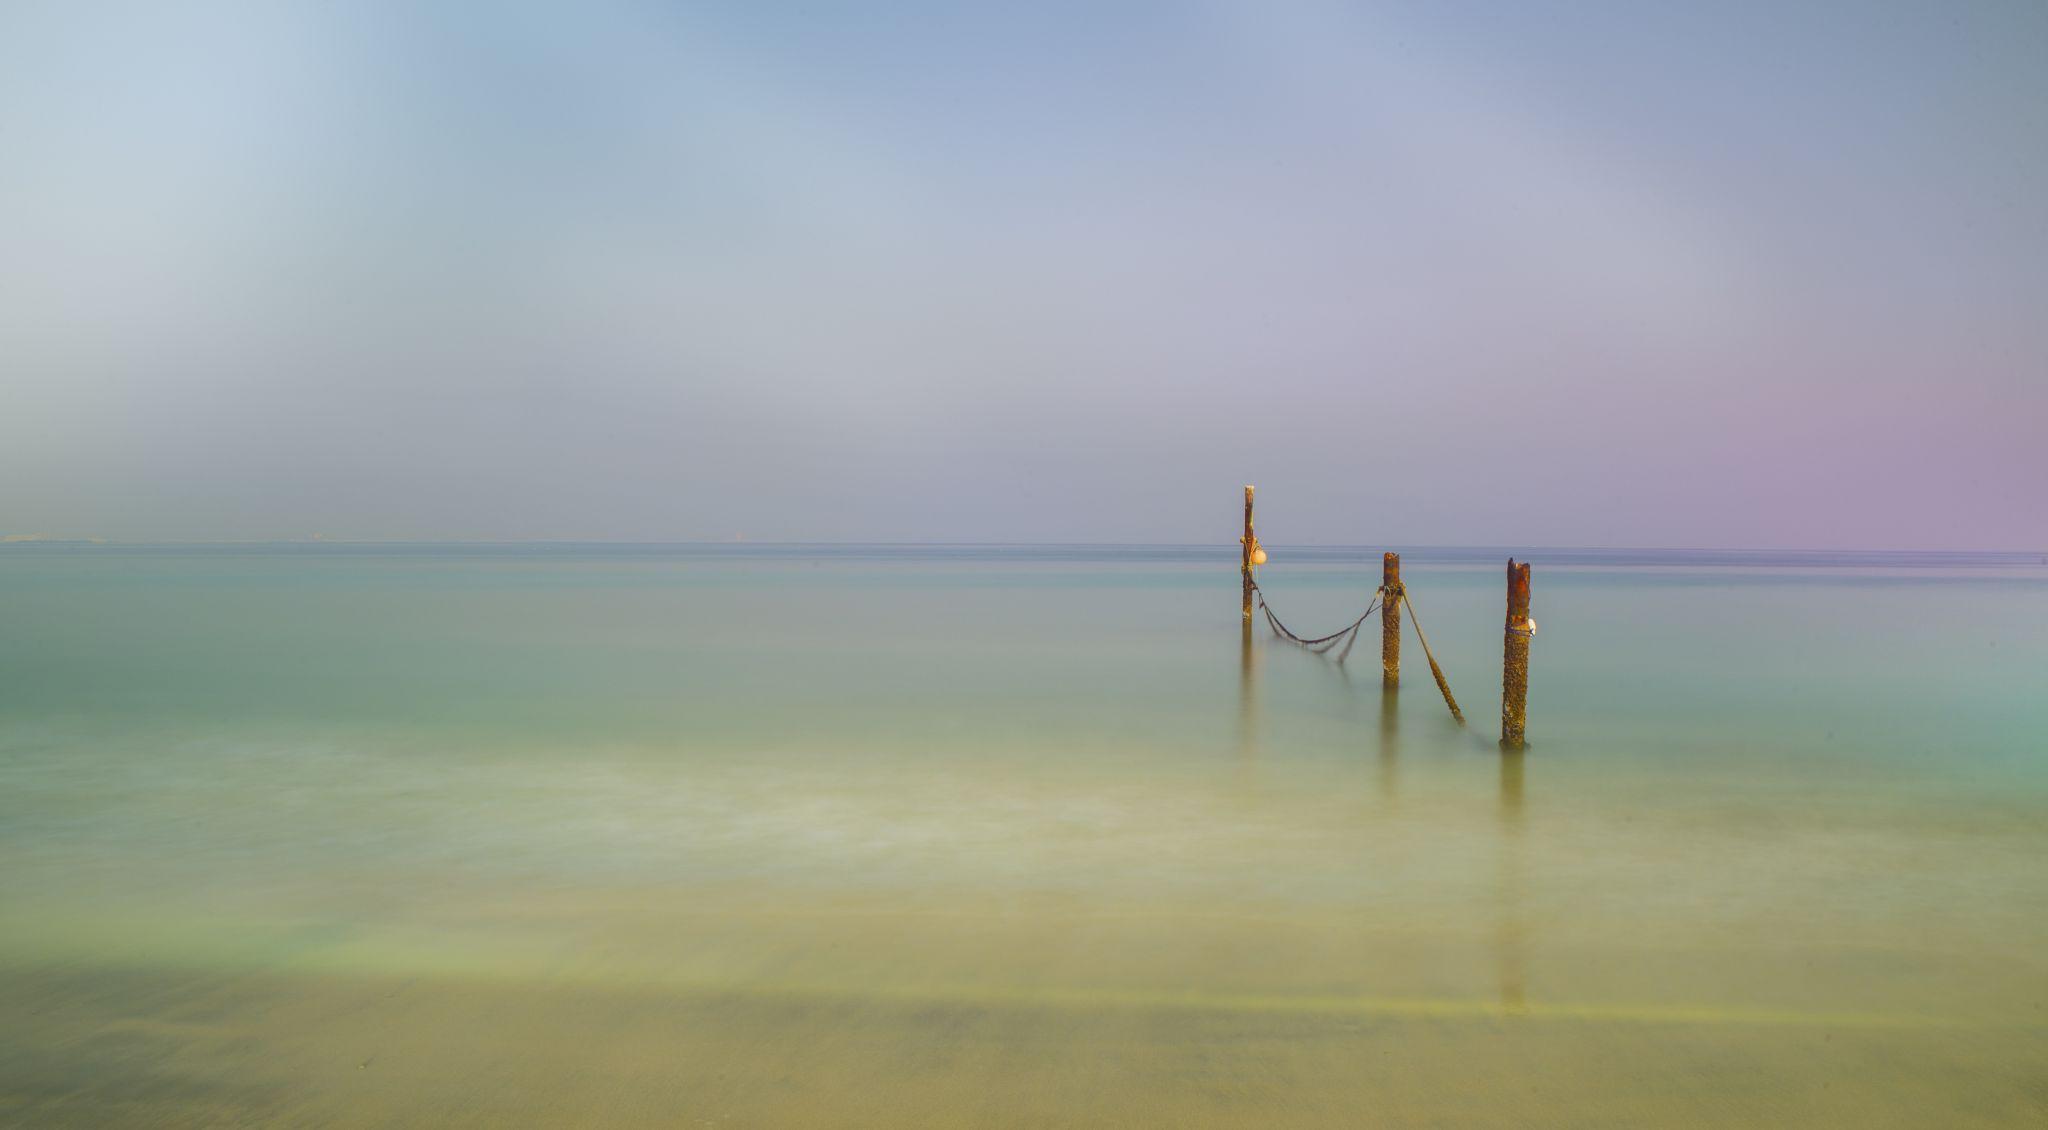 Sharjah Al khan Beach, United Arab Emirates